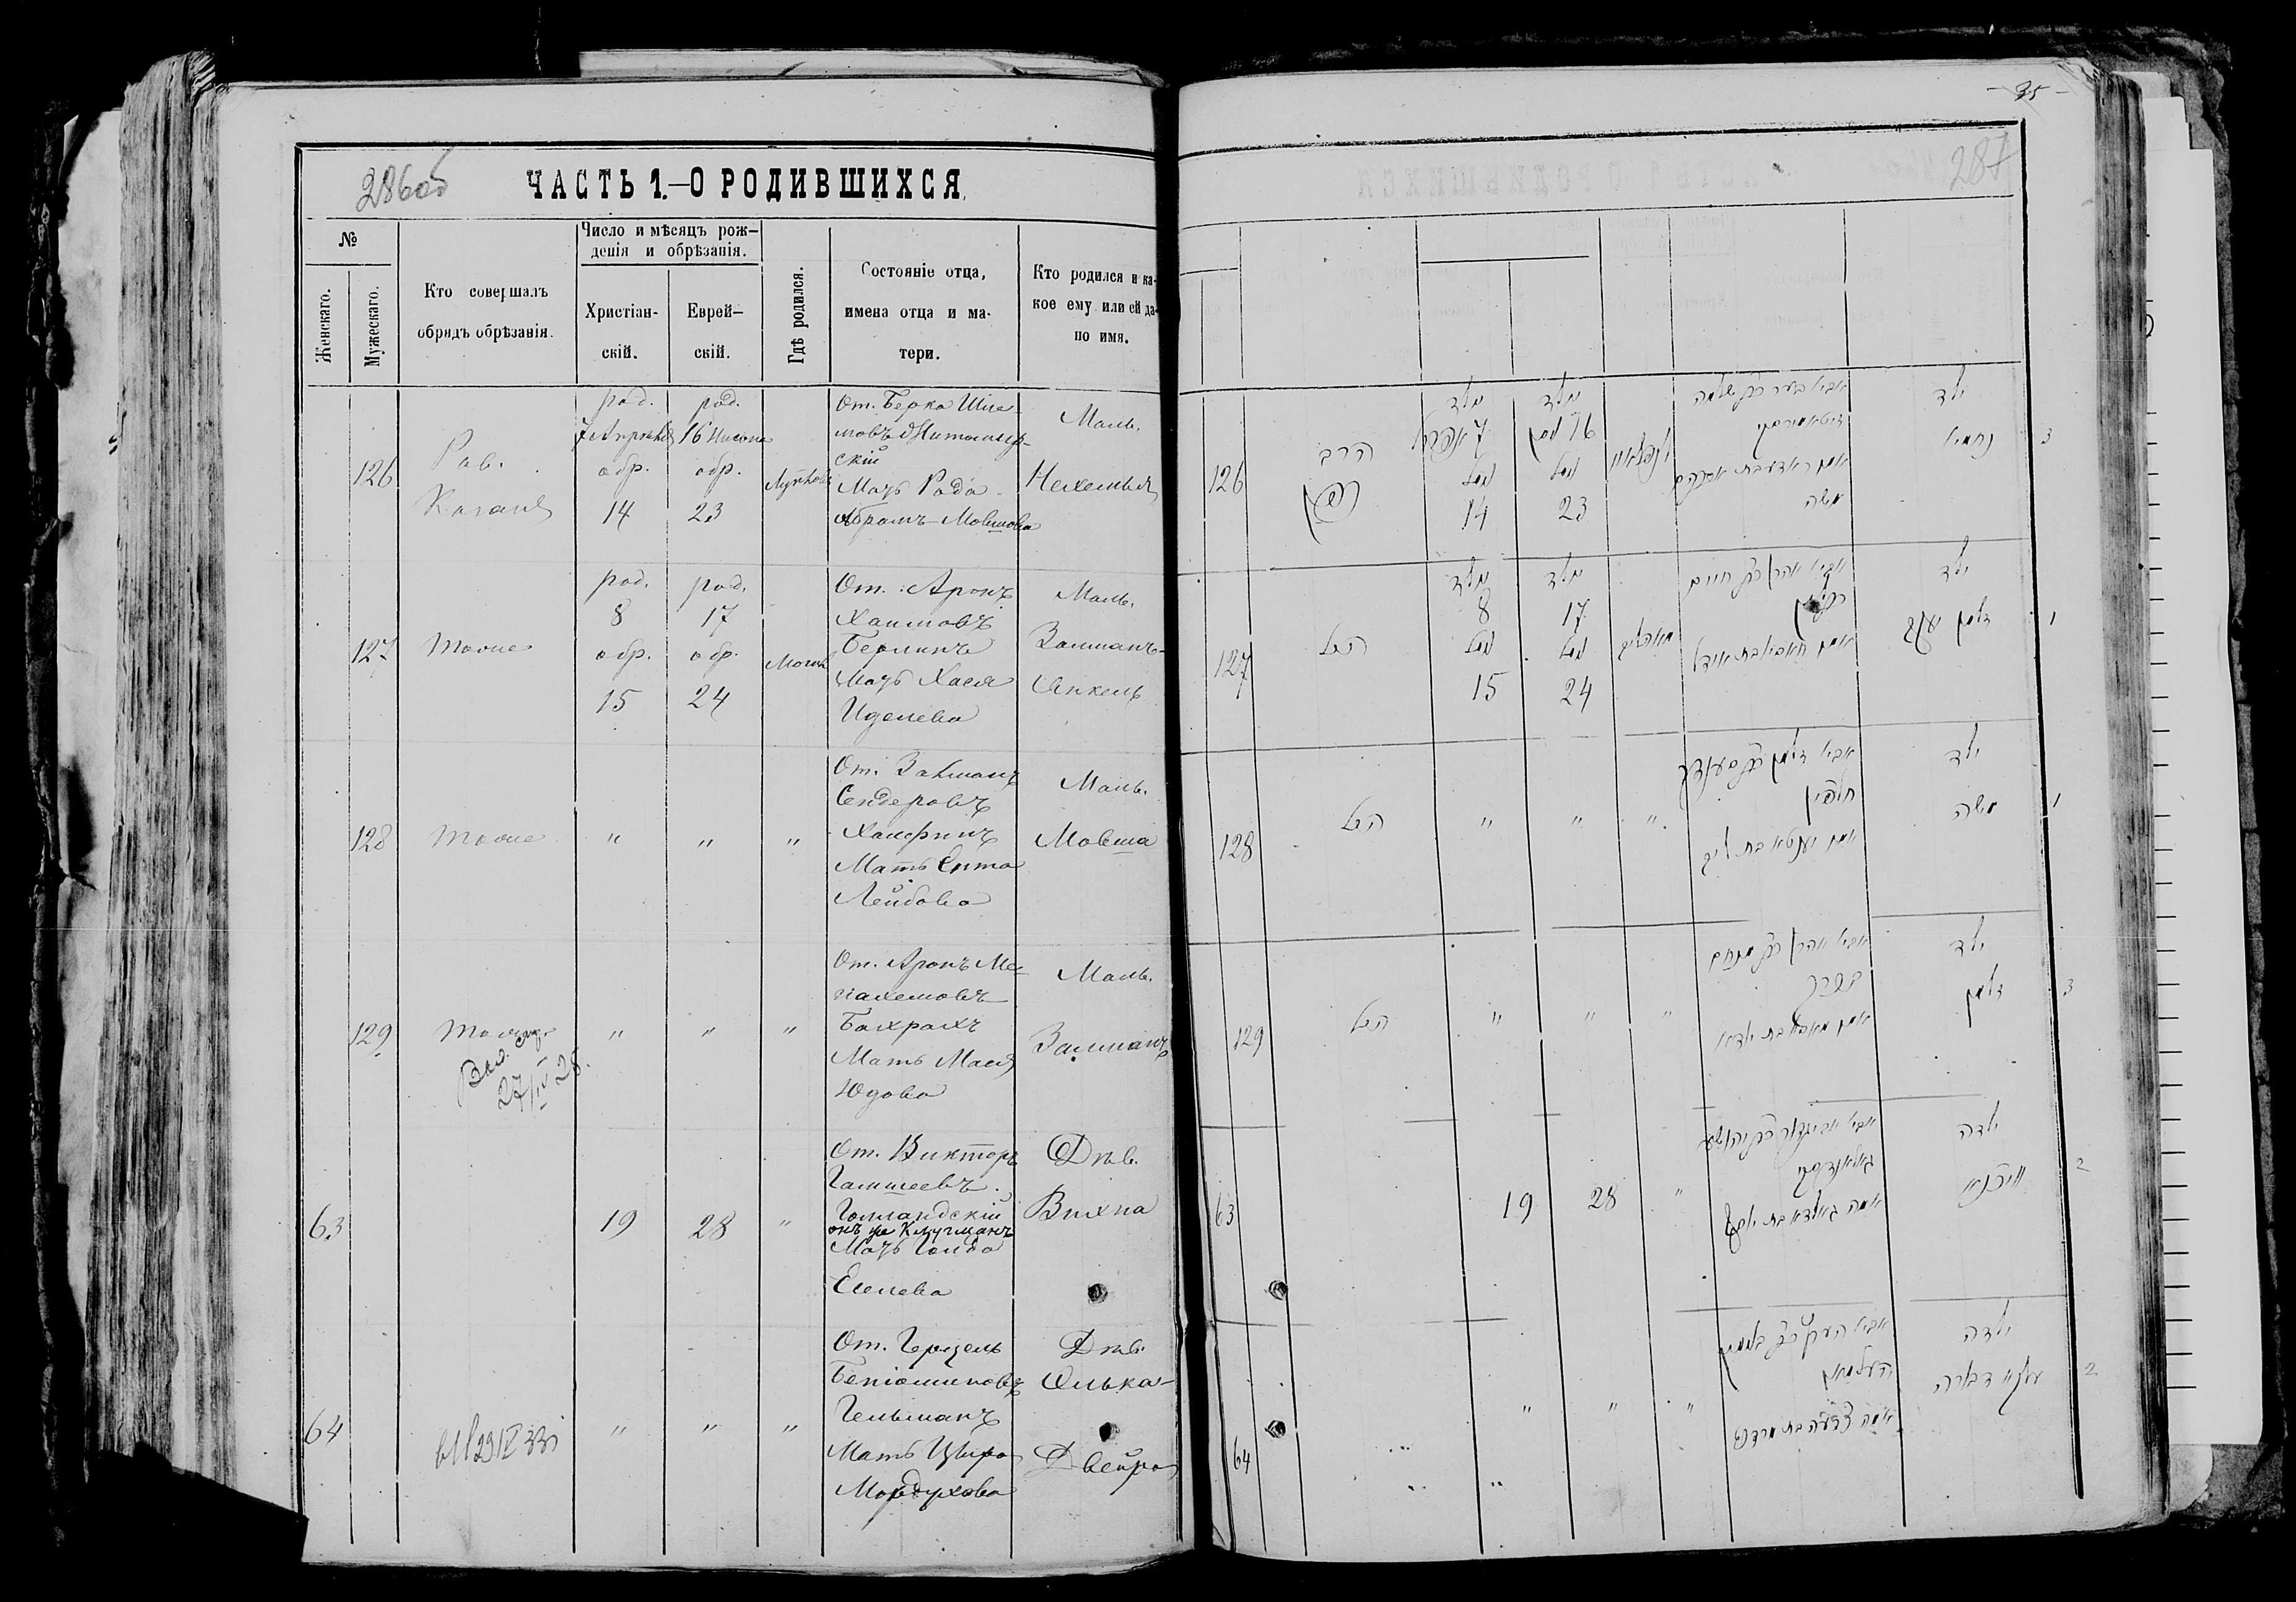 Нехемия Беркович Житомирский 7 апреля 1878, запись 126, пленка 007766481, снимок 816